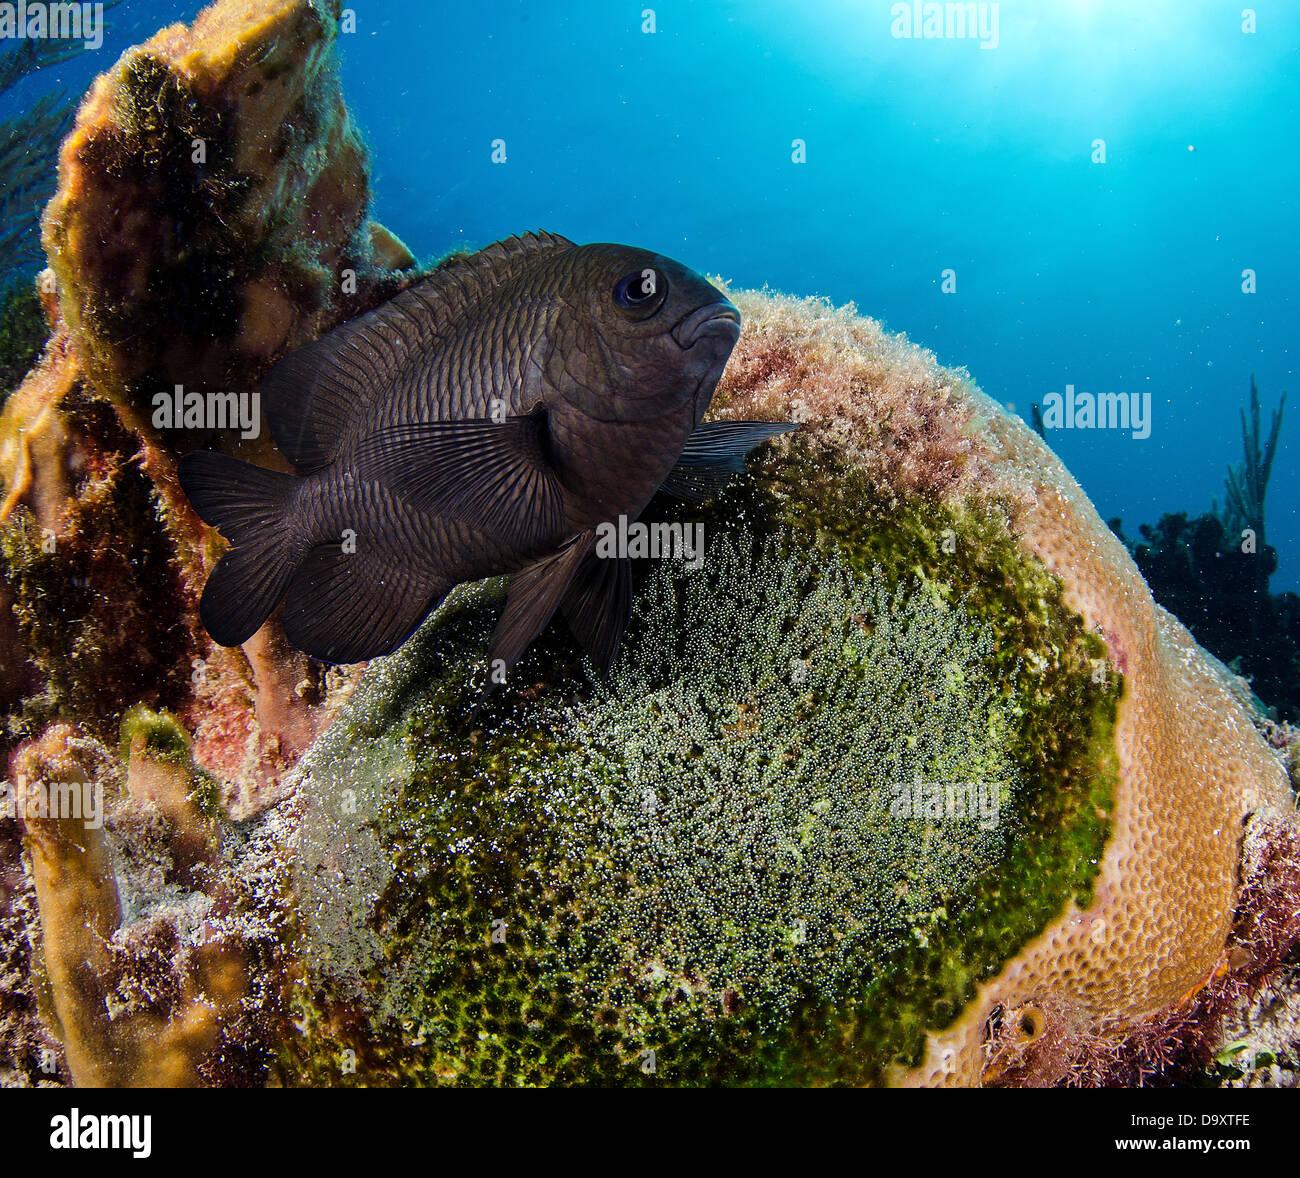 Threespot damisela, Stegastes planifrons protegiendo sus huevos en arrecifes de coral cerca de Cancún, México, el mar Caribe Foto de stock